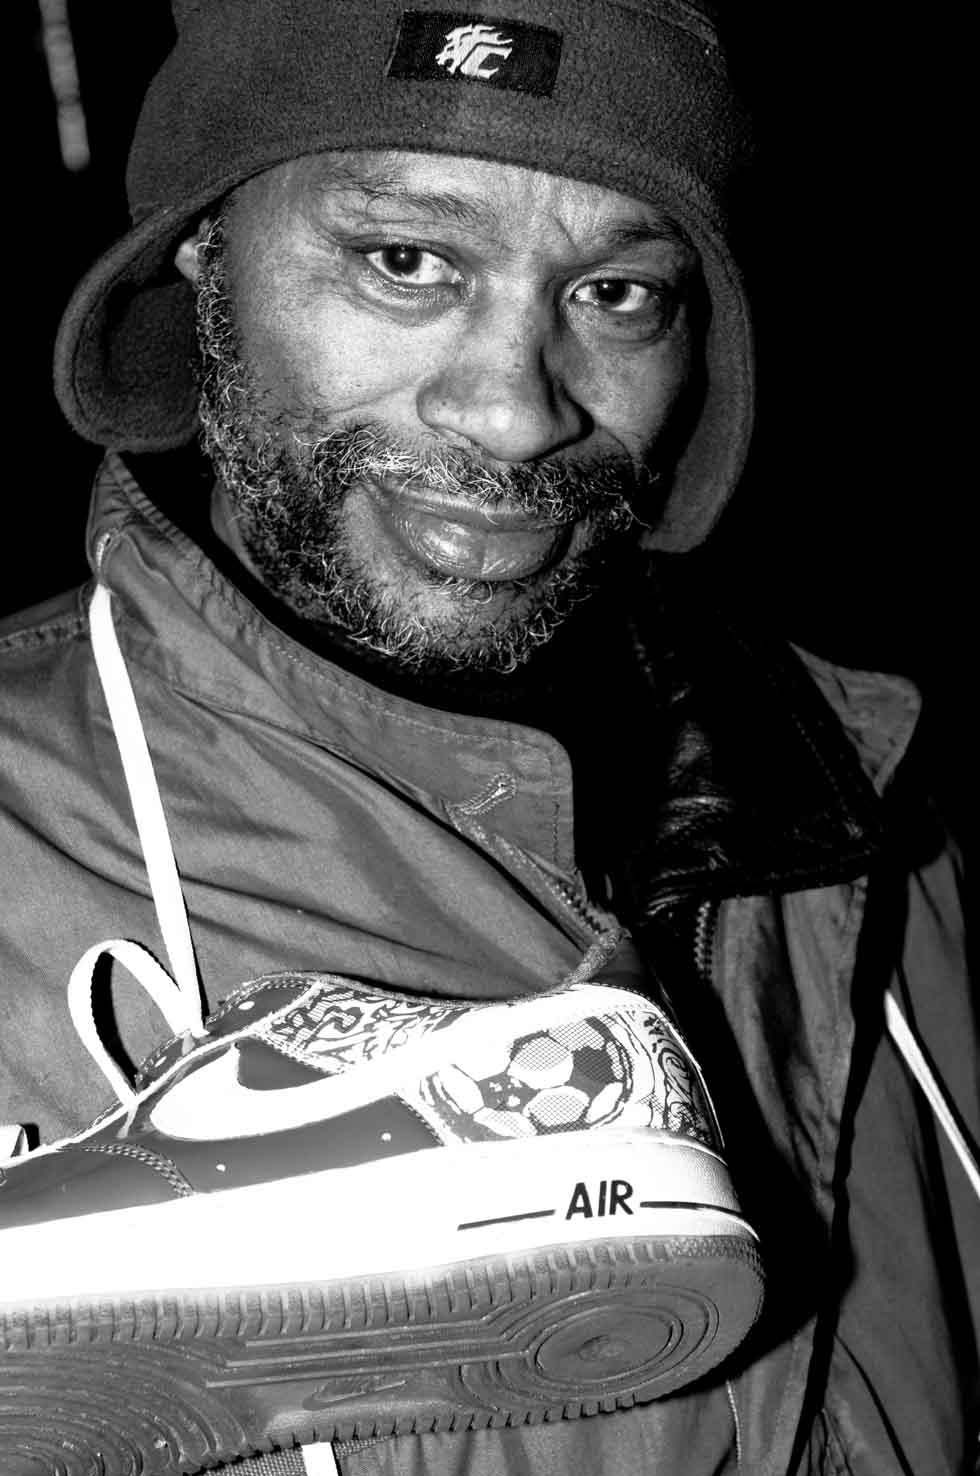 zum-schneider-nyc-2012-karneval-apocalyptika-4994.jpg